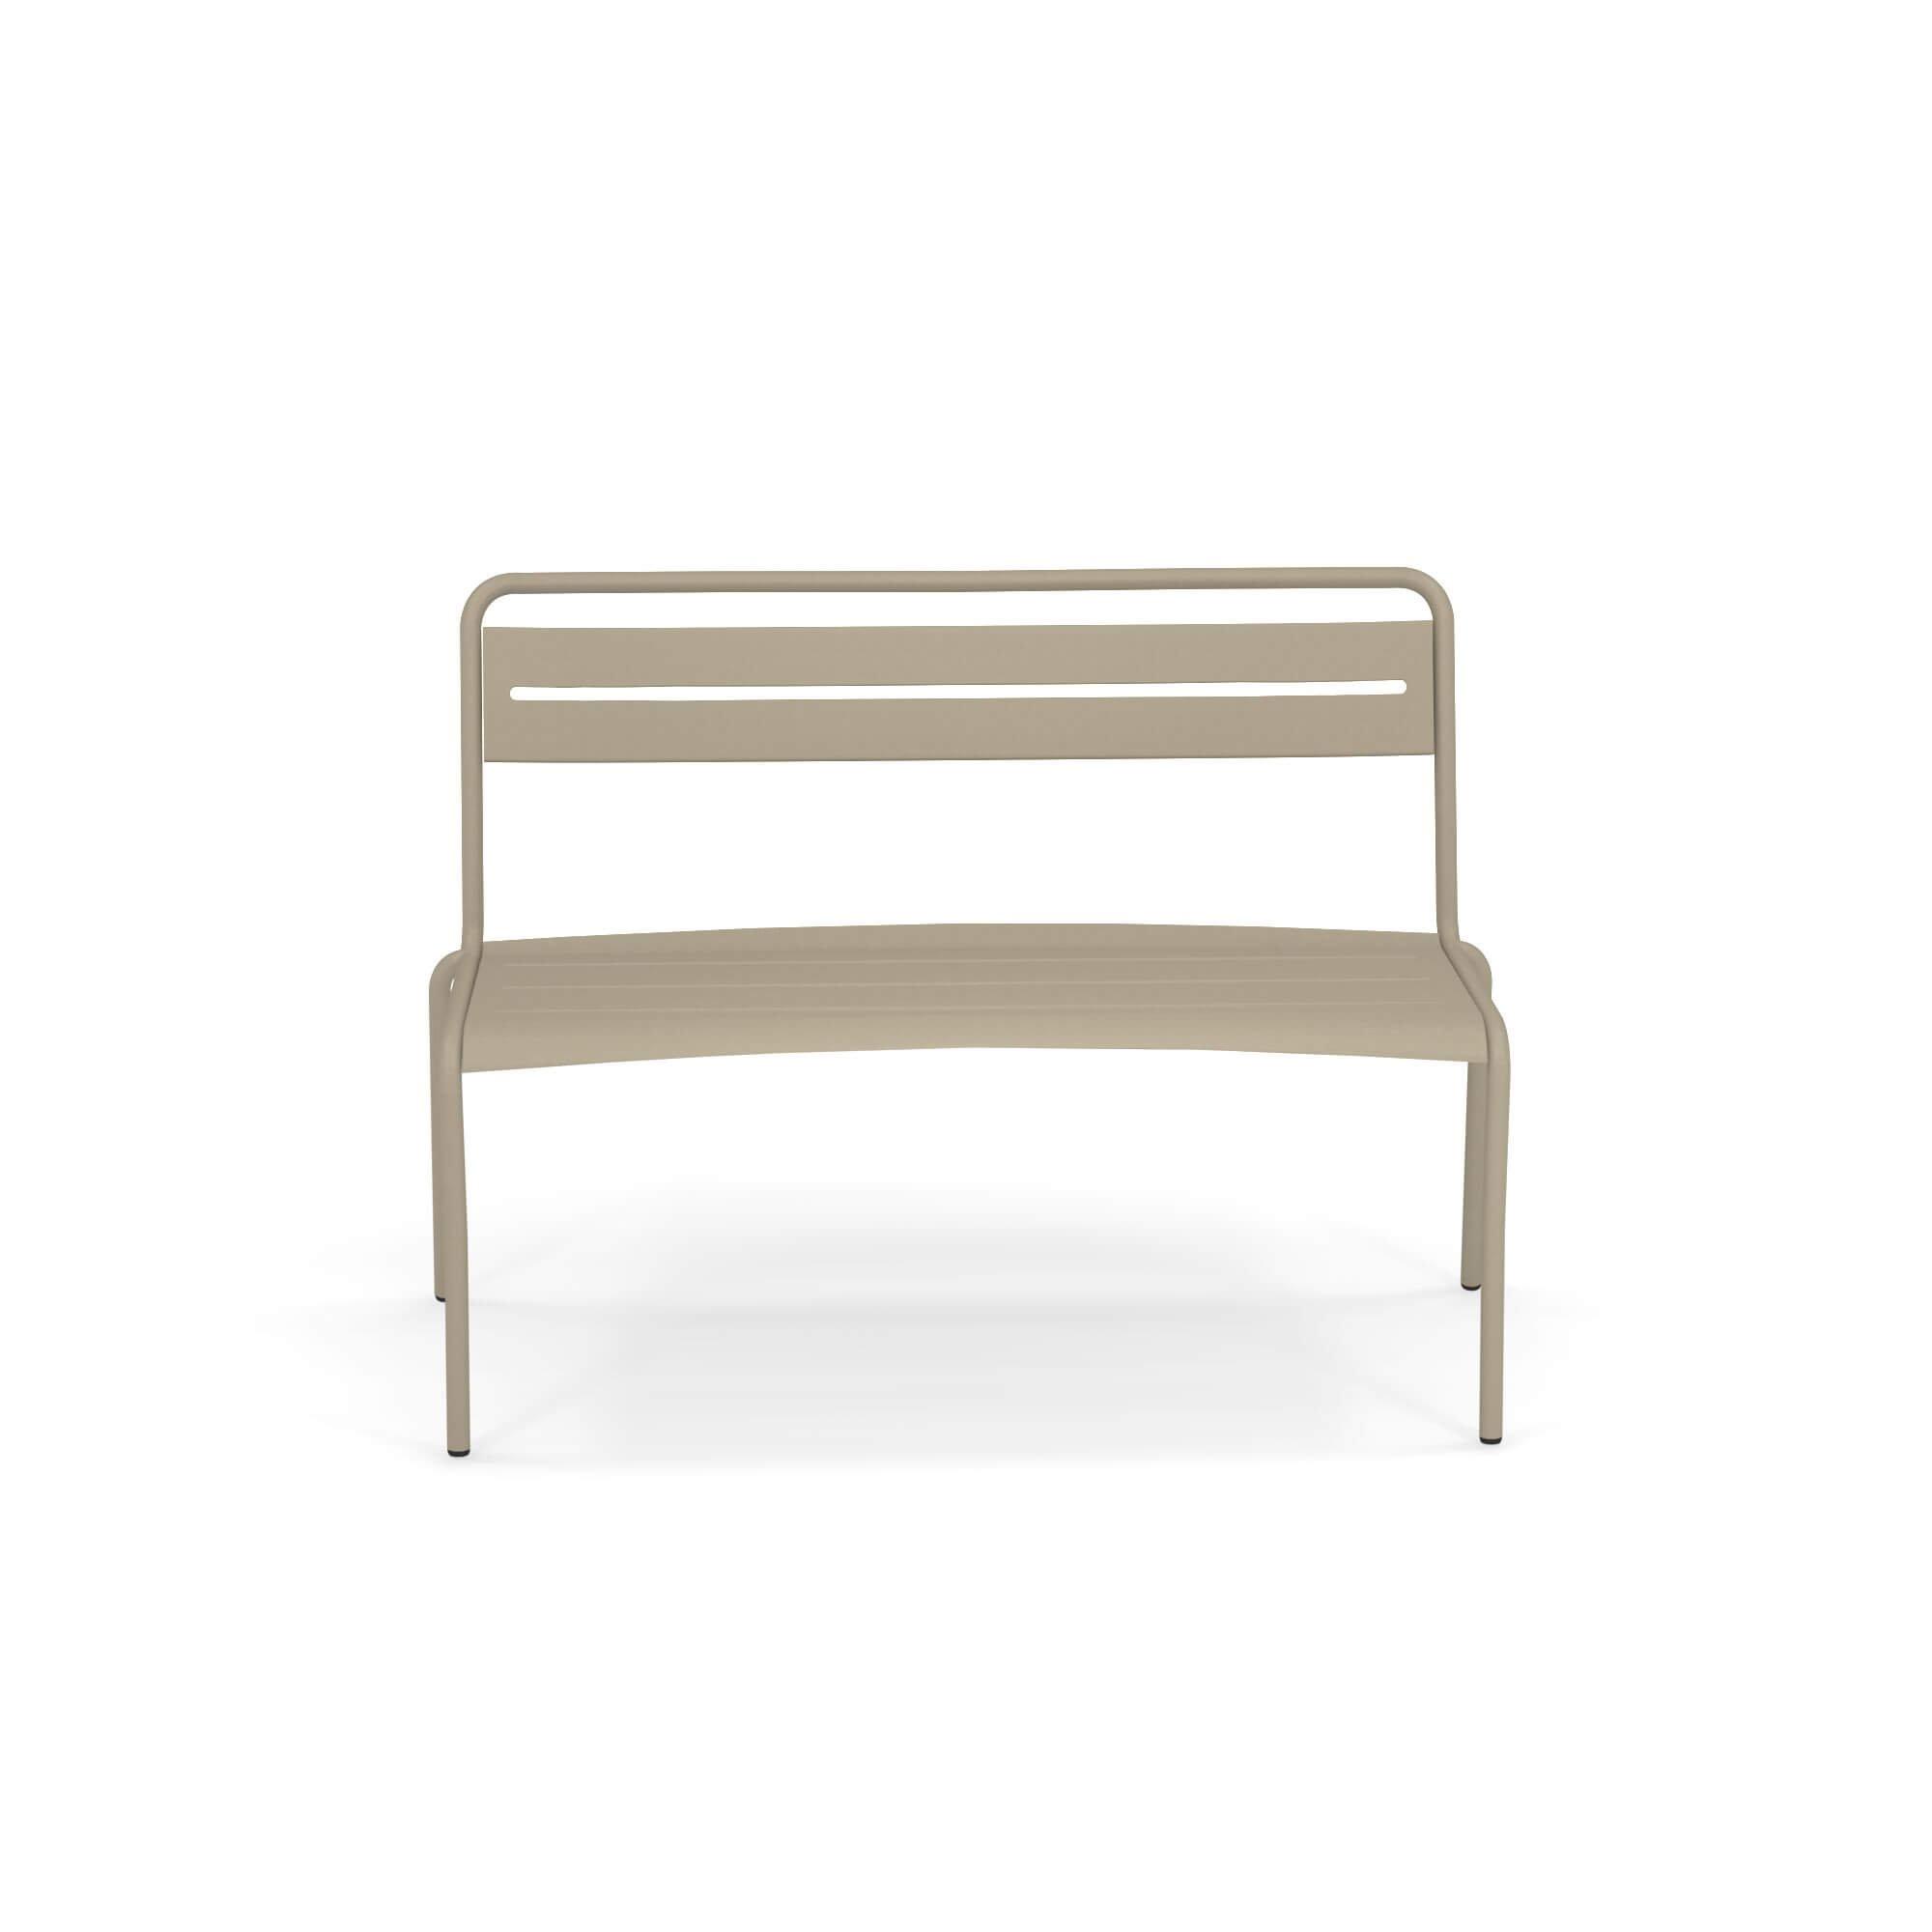 Star Bench from Emu, designed by EMU Design Studio